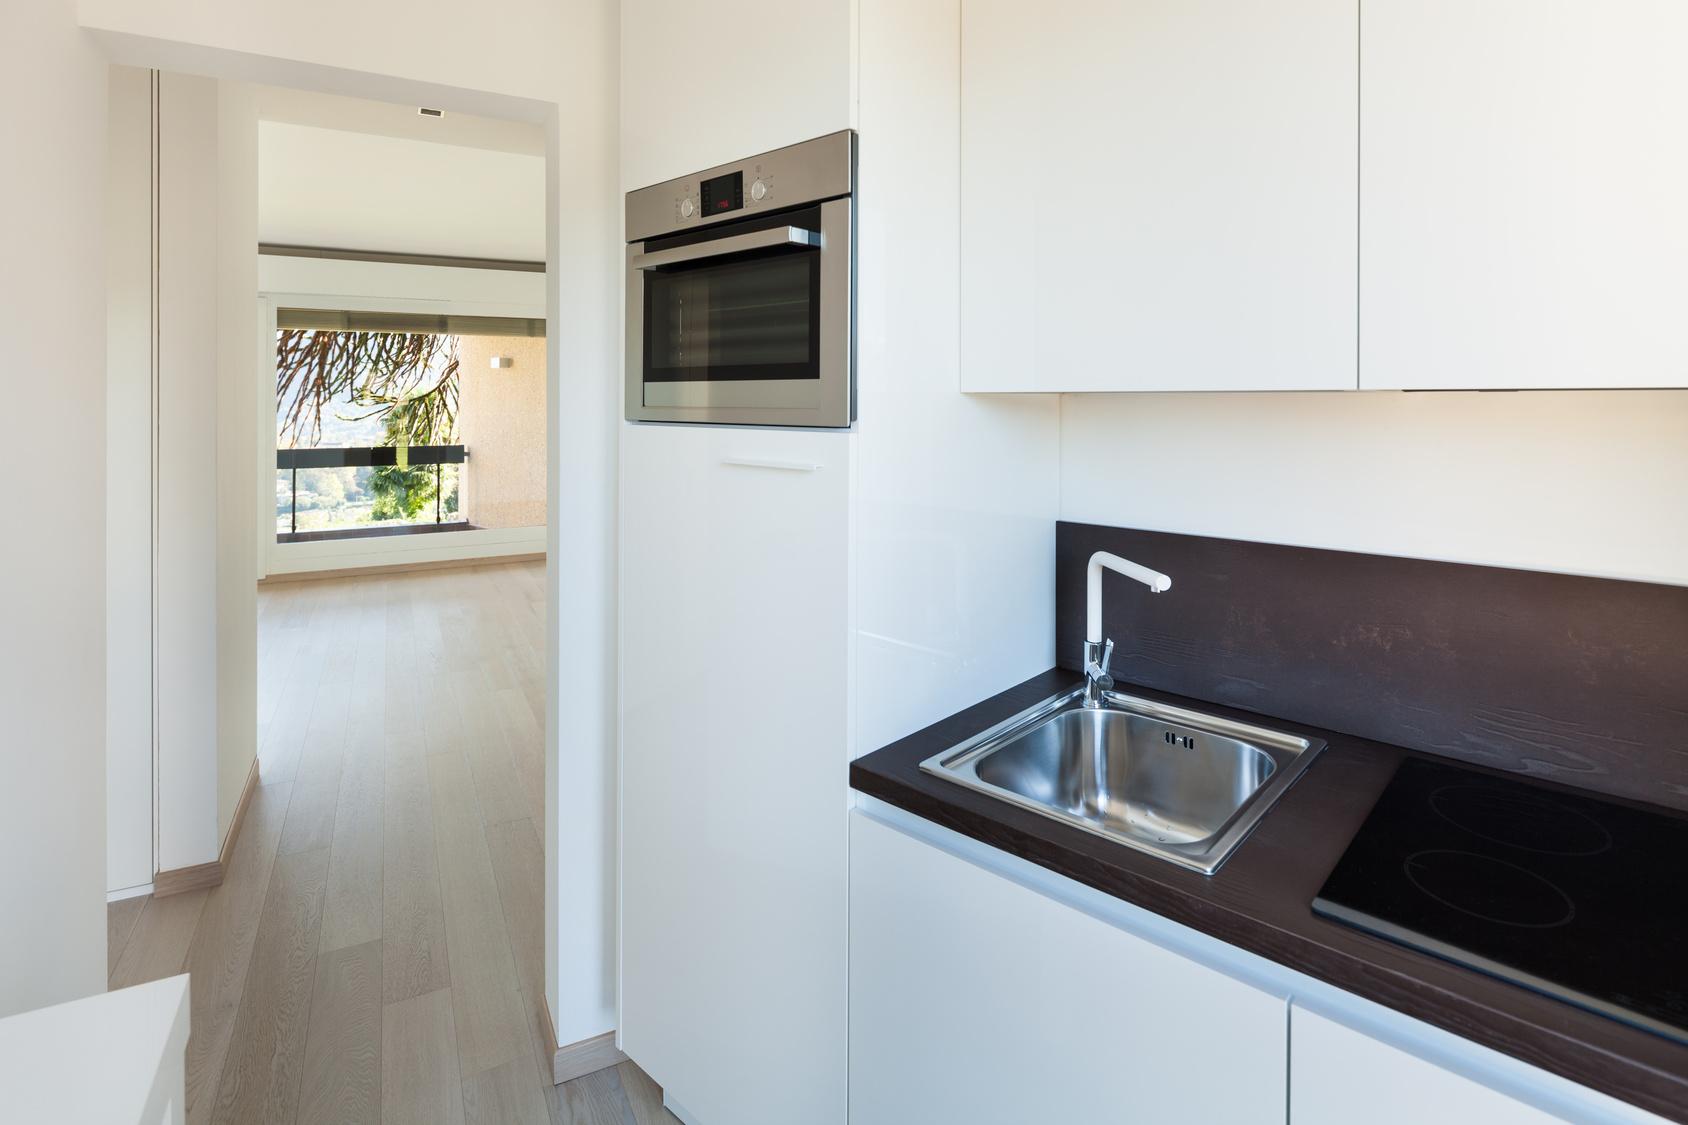 Full Size of Interiors Building, Modern Apartment, Kitchen View Küche Miniküche